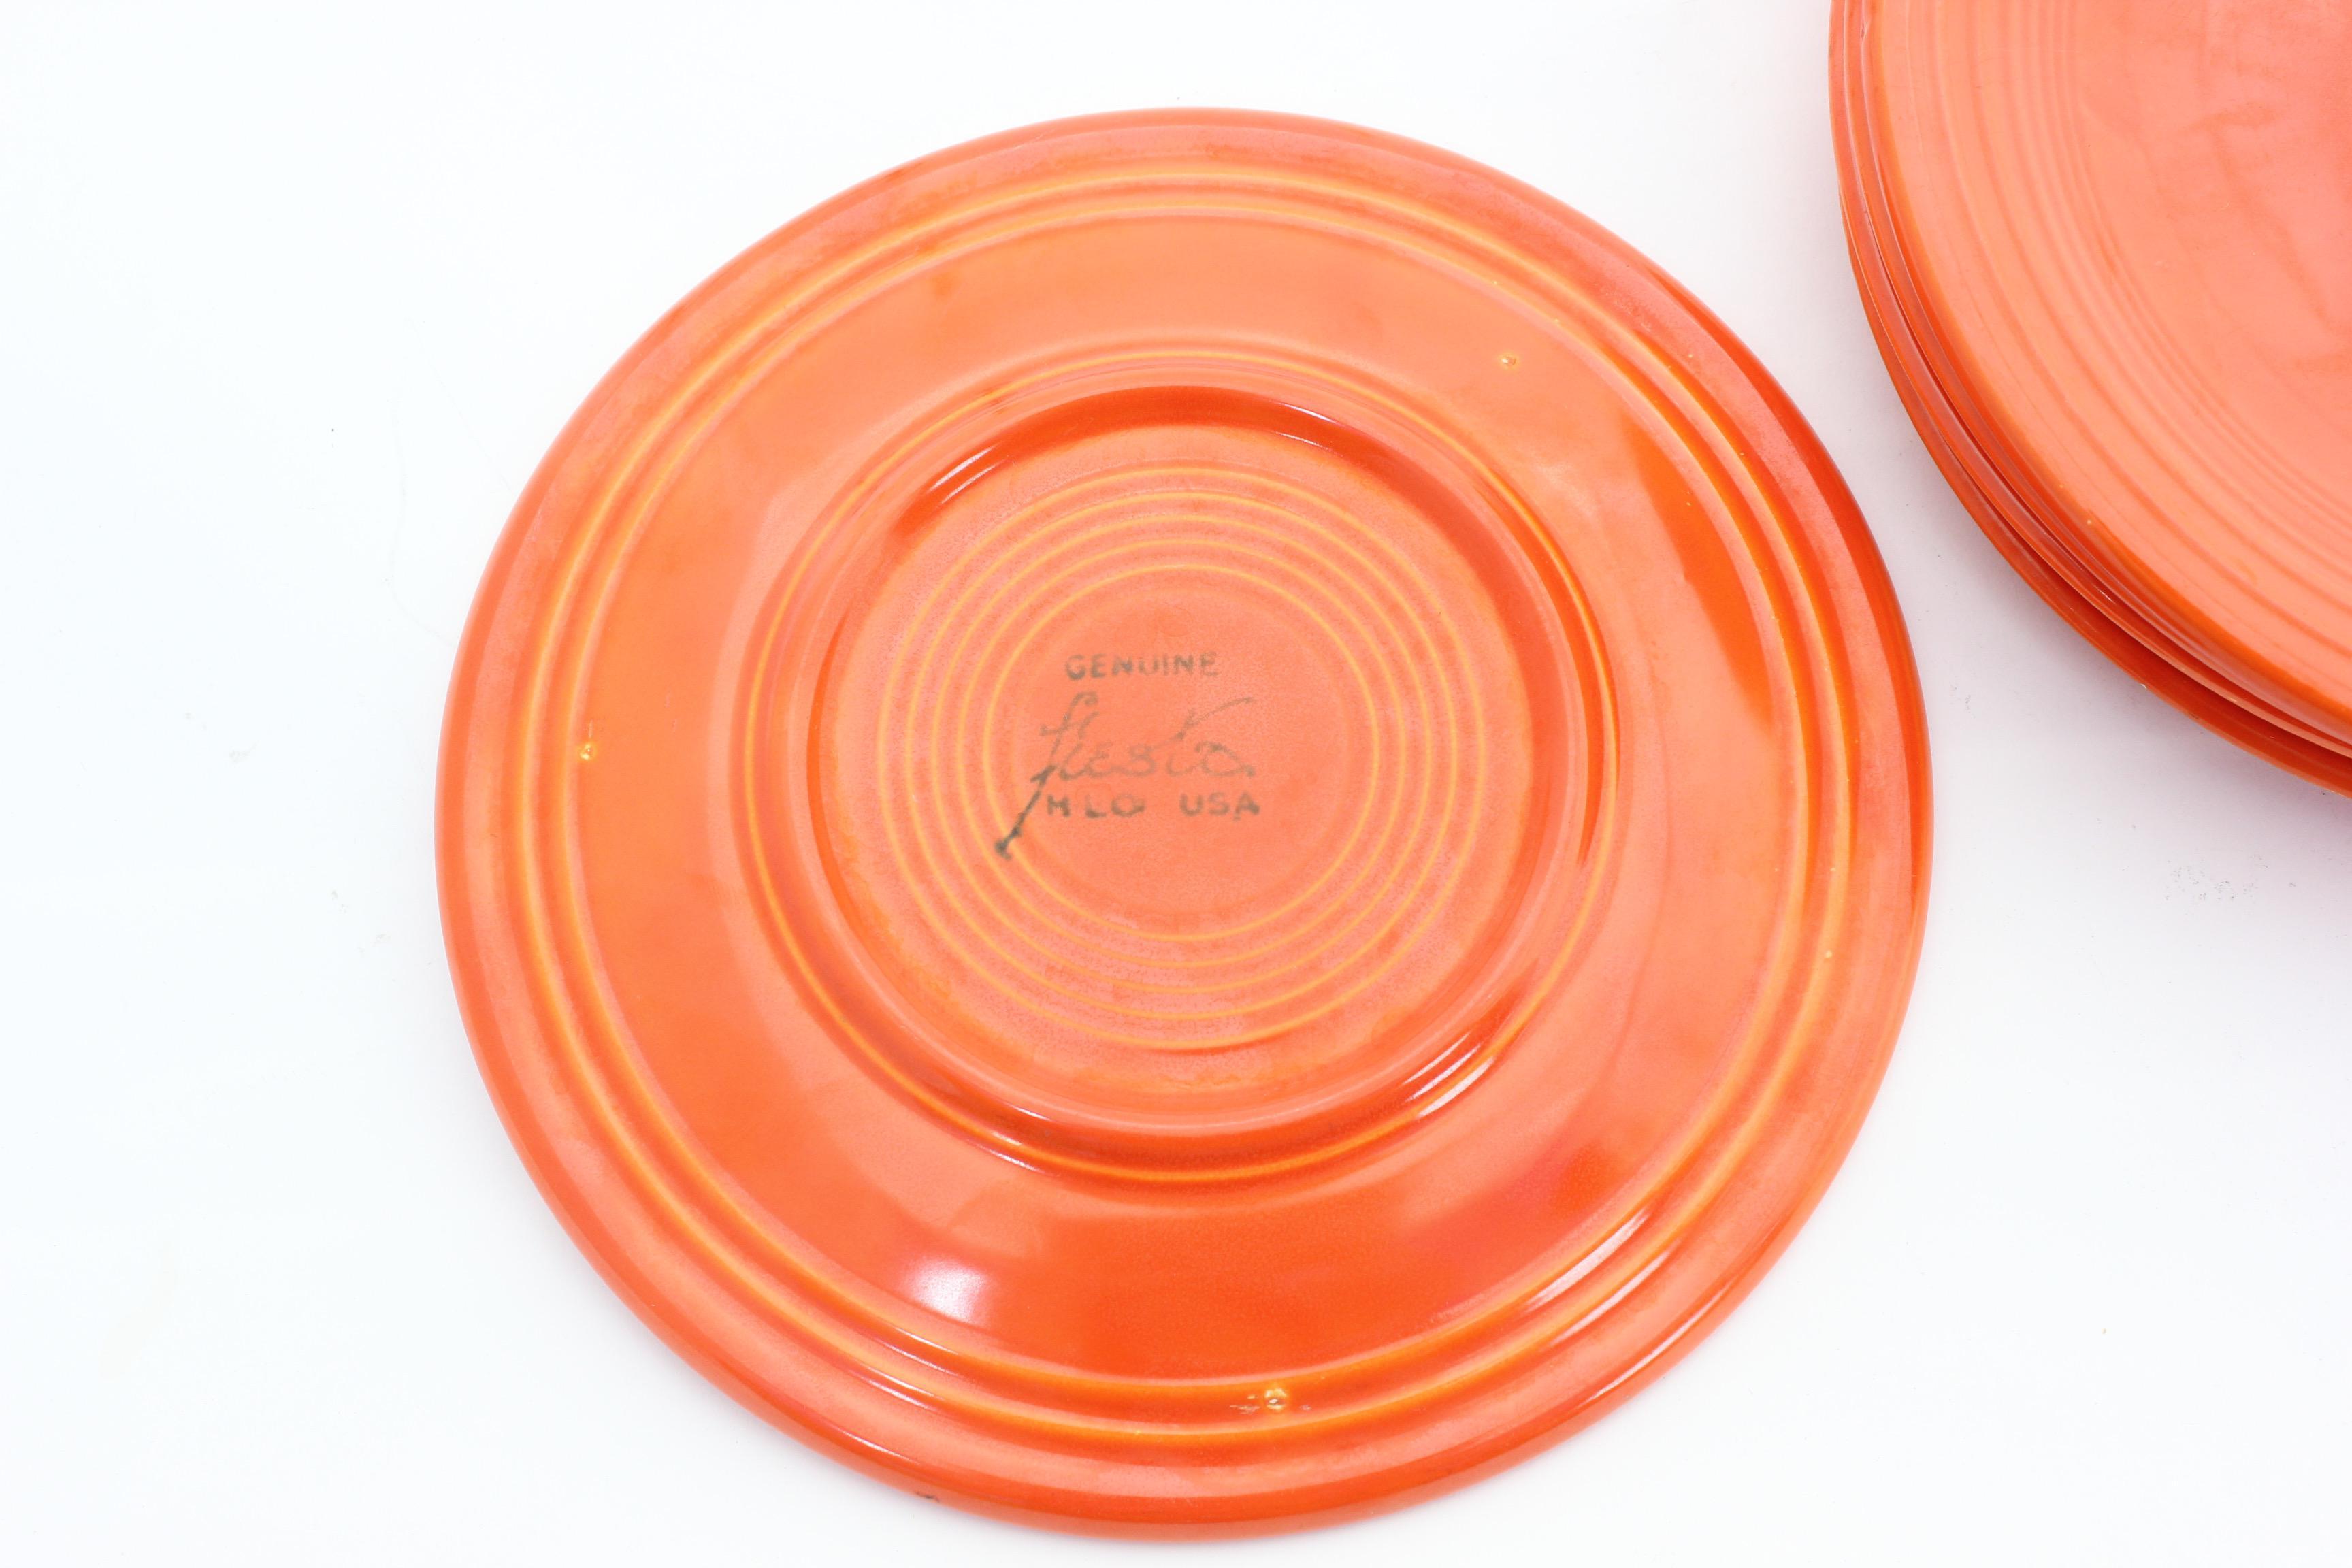 Vintage  Radioactive  Orange Fiesta Ware Plates - Set of 5 - Image ...  sc 1 st  Chairish & Vintage